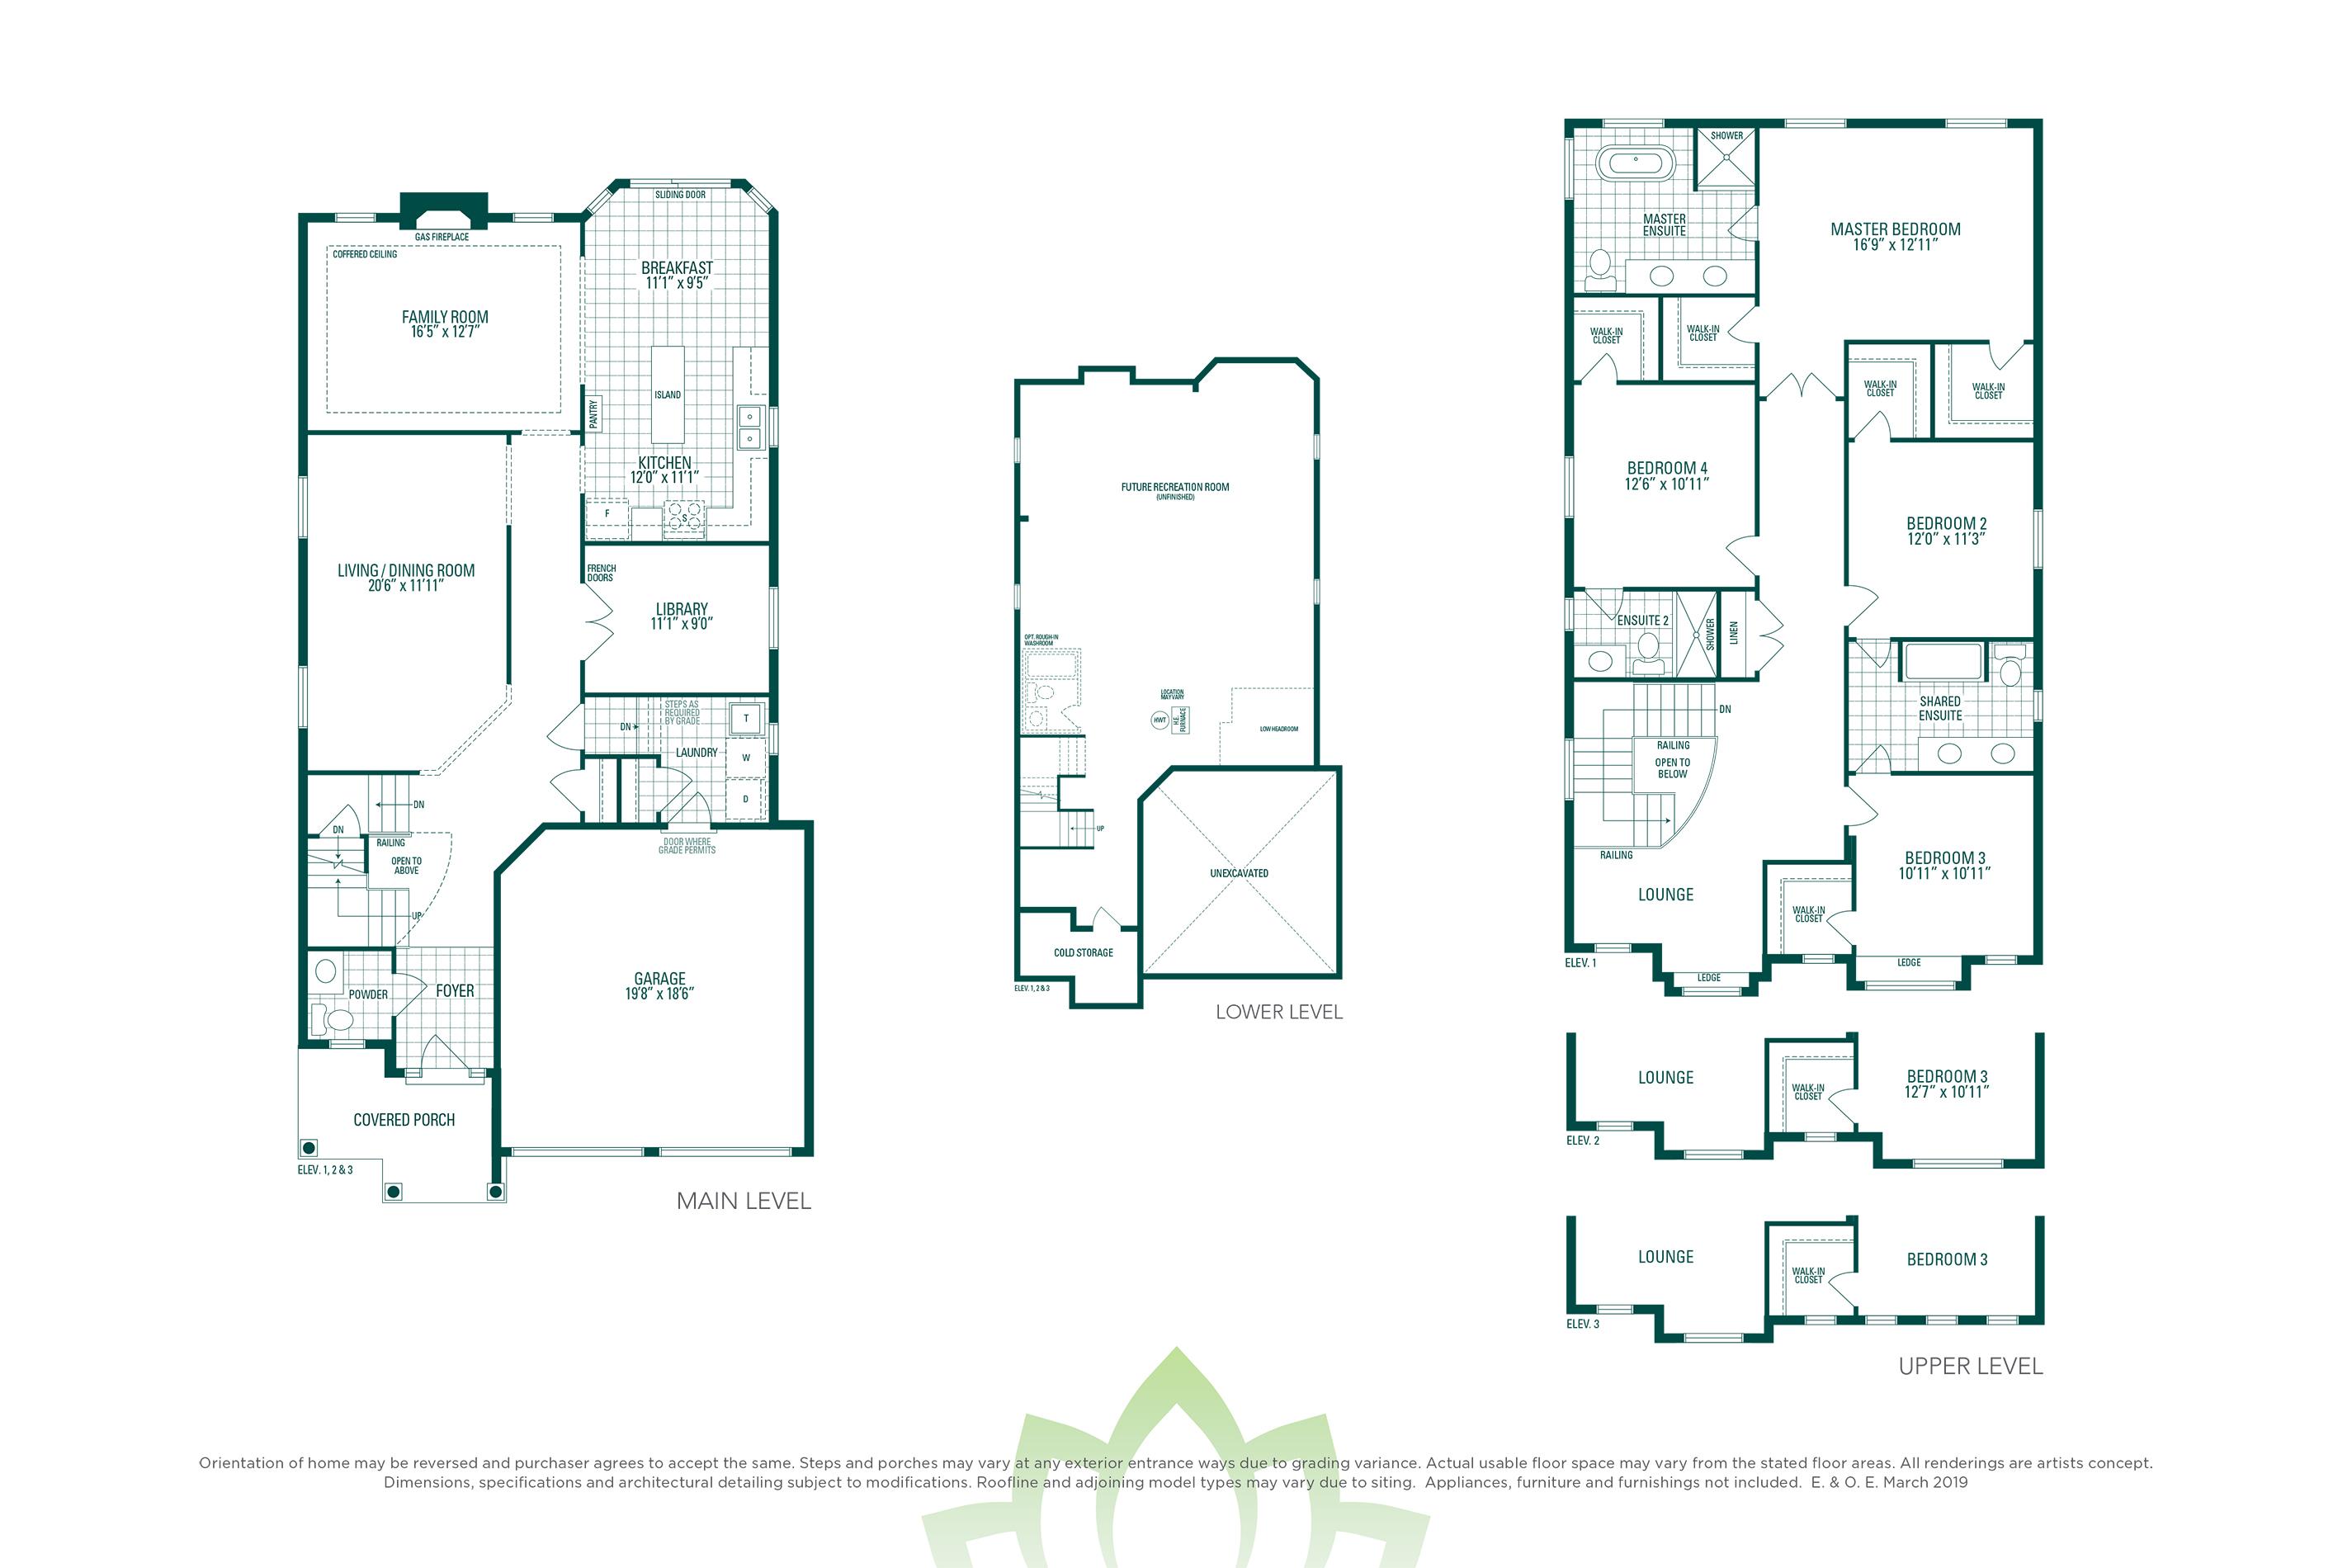 Millwood 4A Floorplan